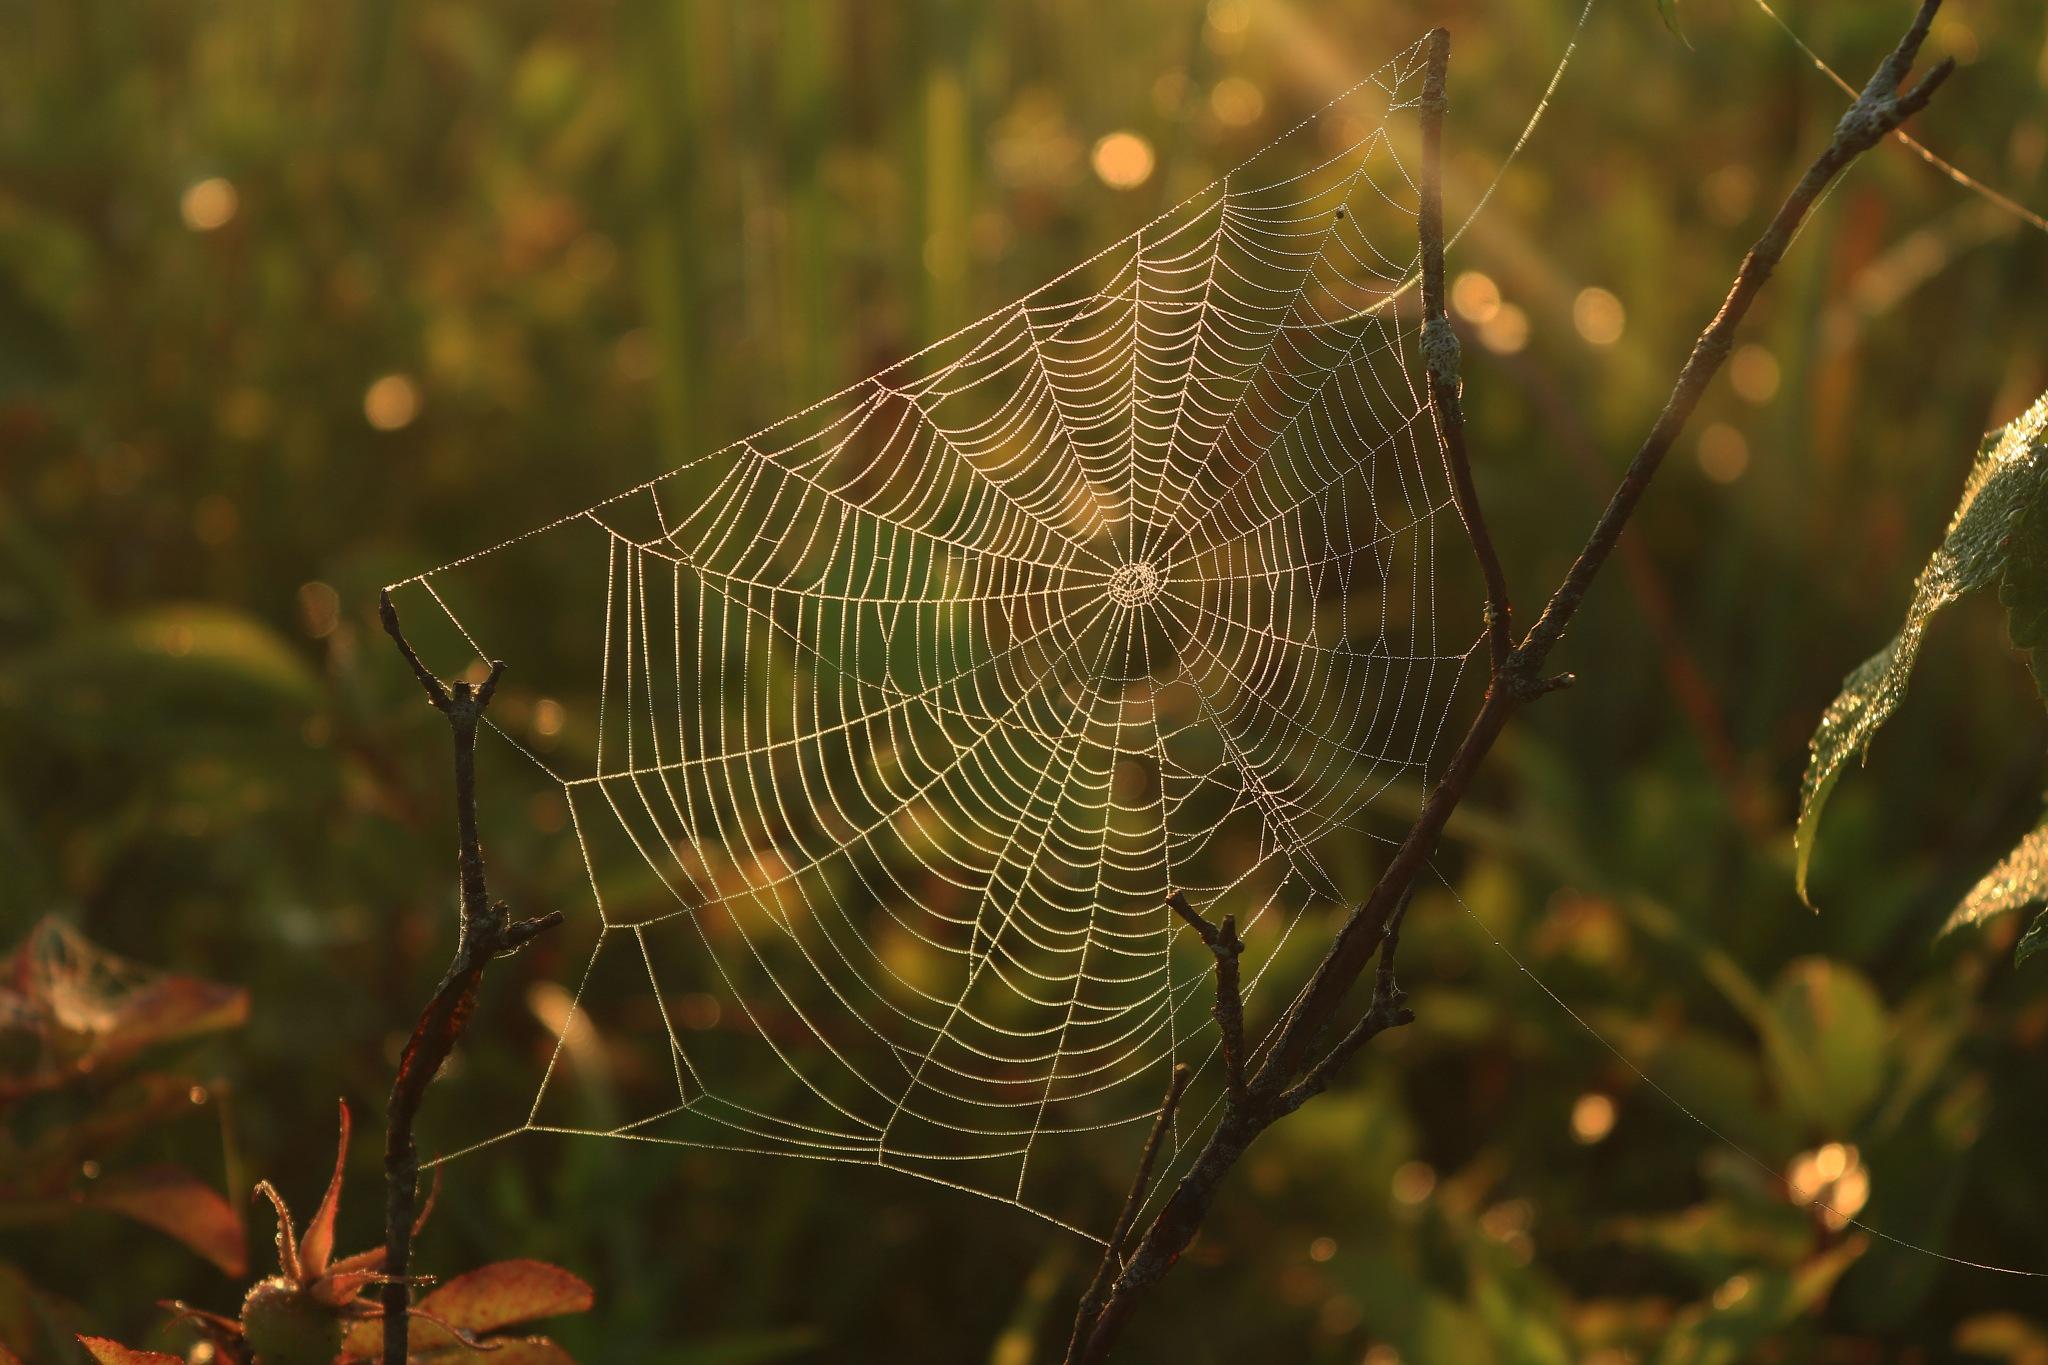 Lit Web by Jeff Pudlinski